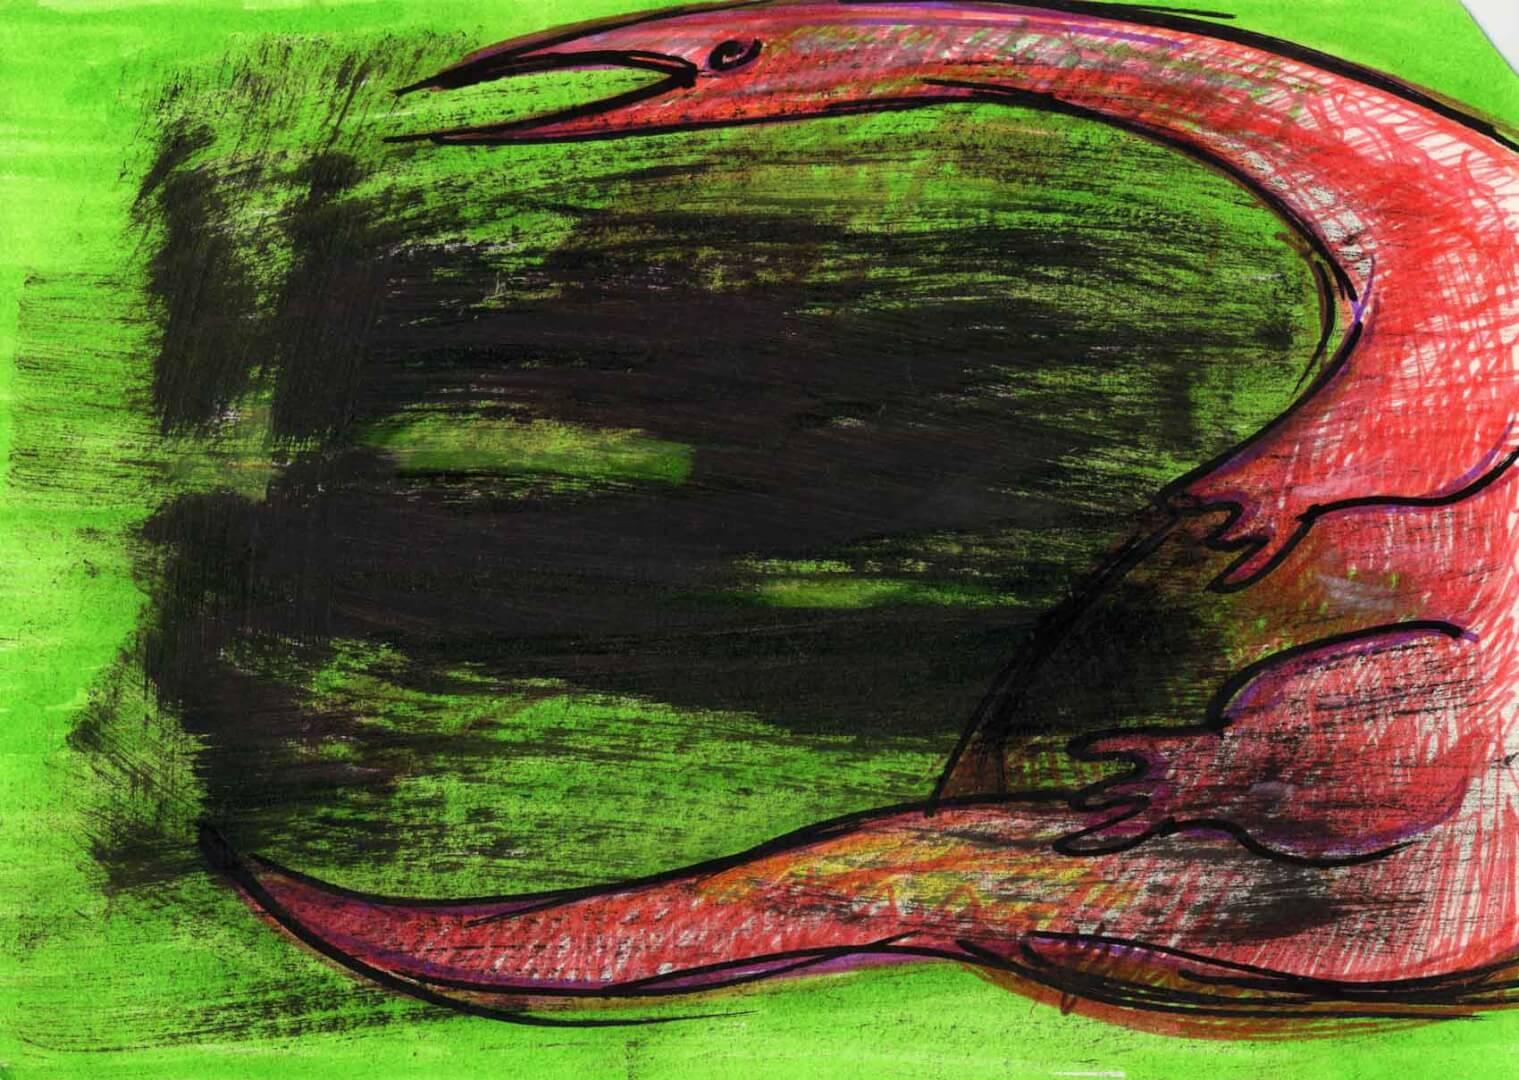 Dinosaure au repos © David Noir | Dessins, peintures, collages